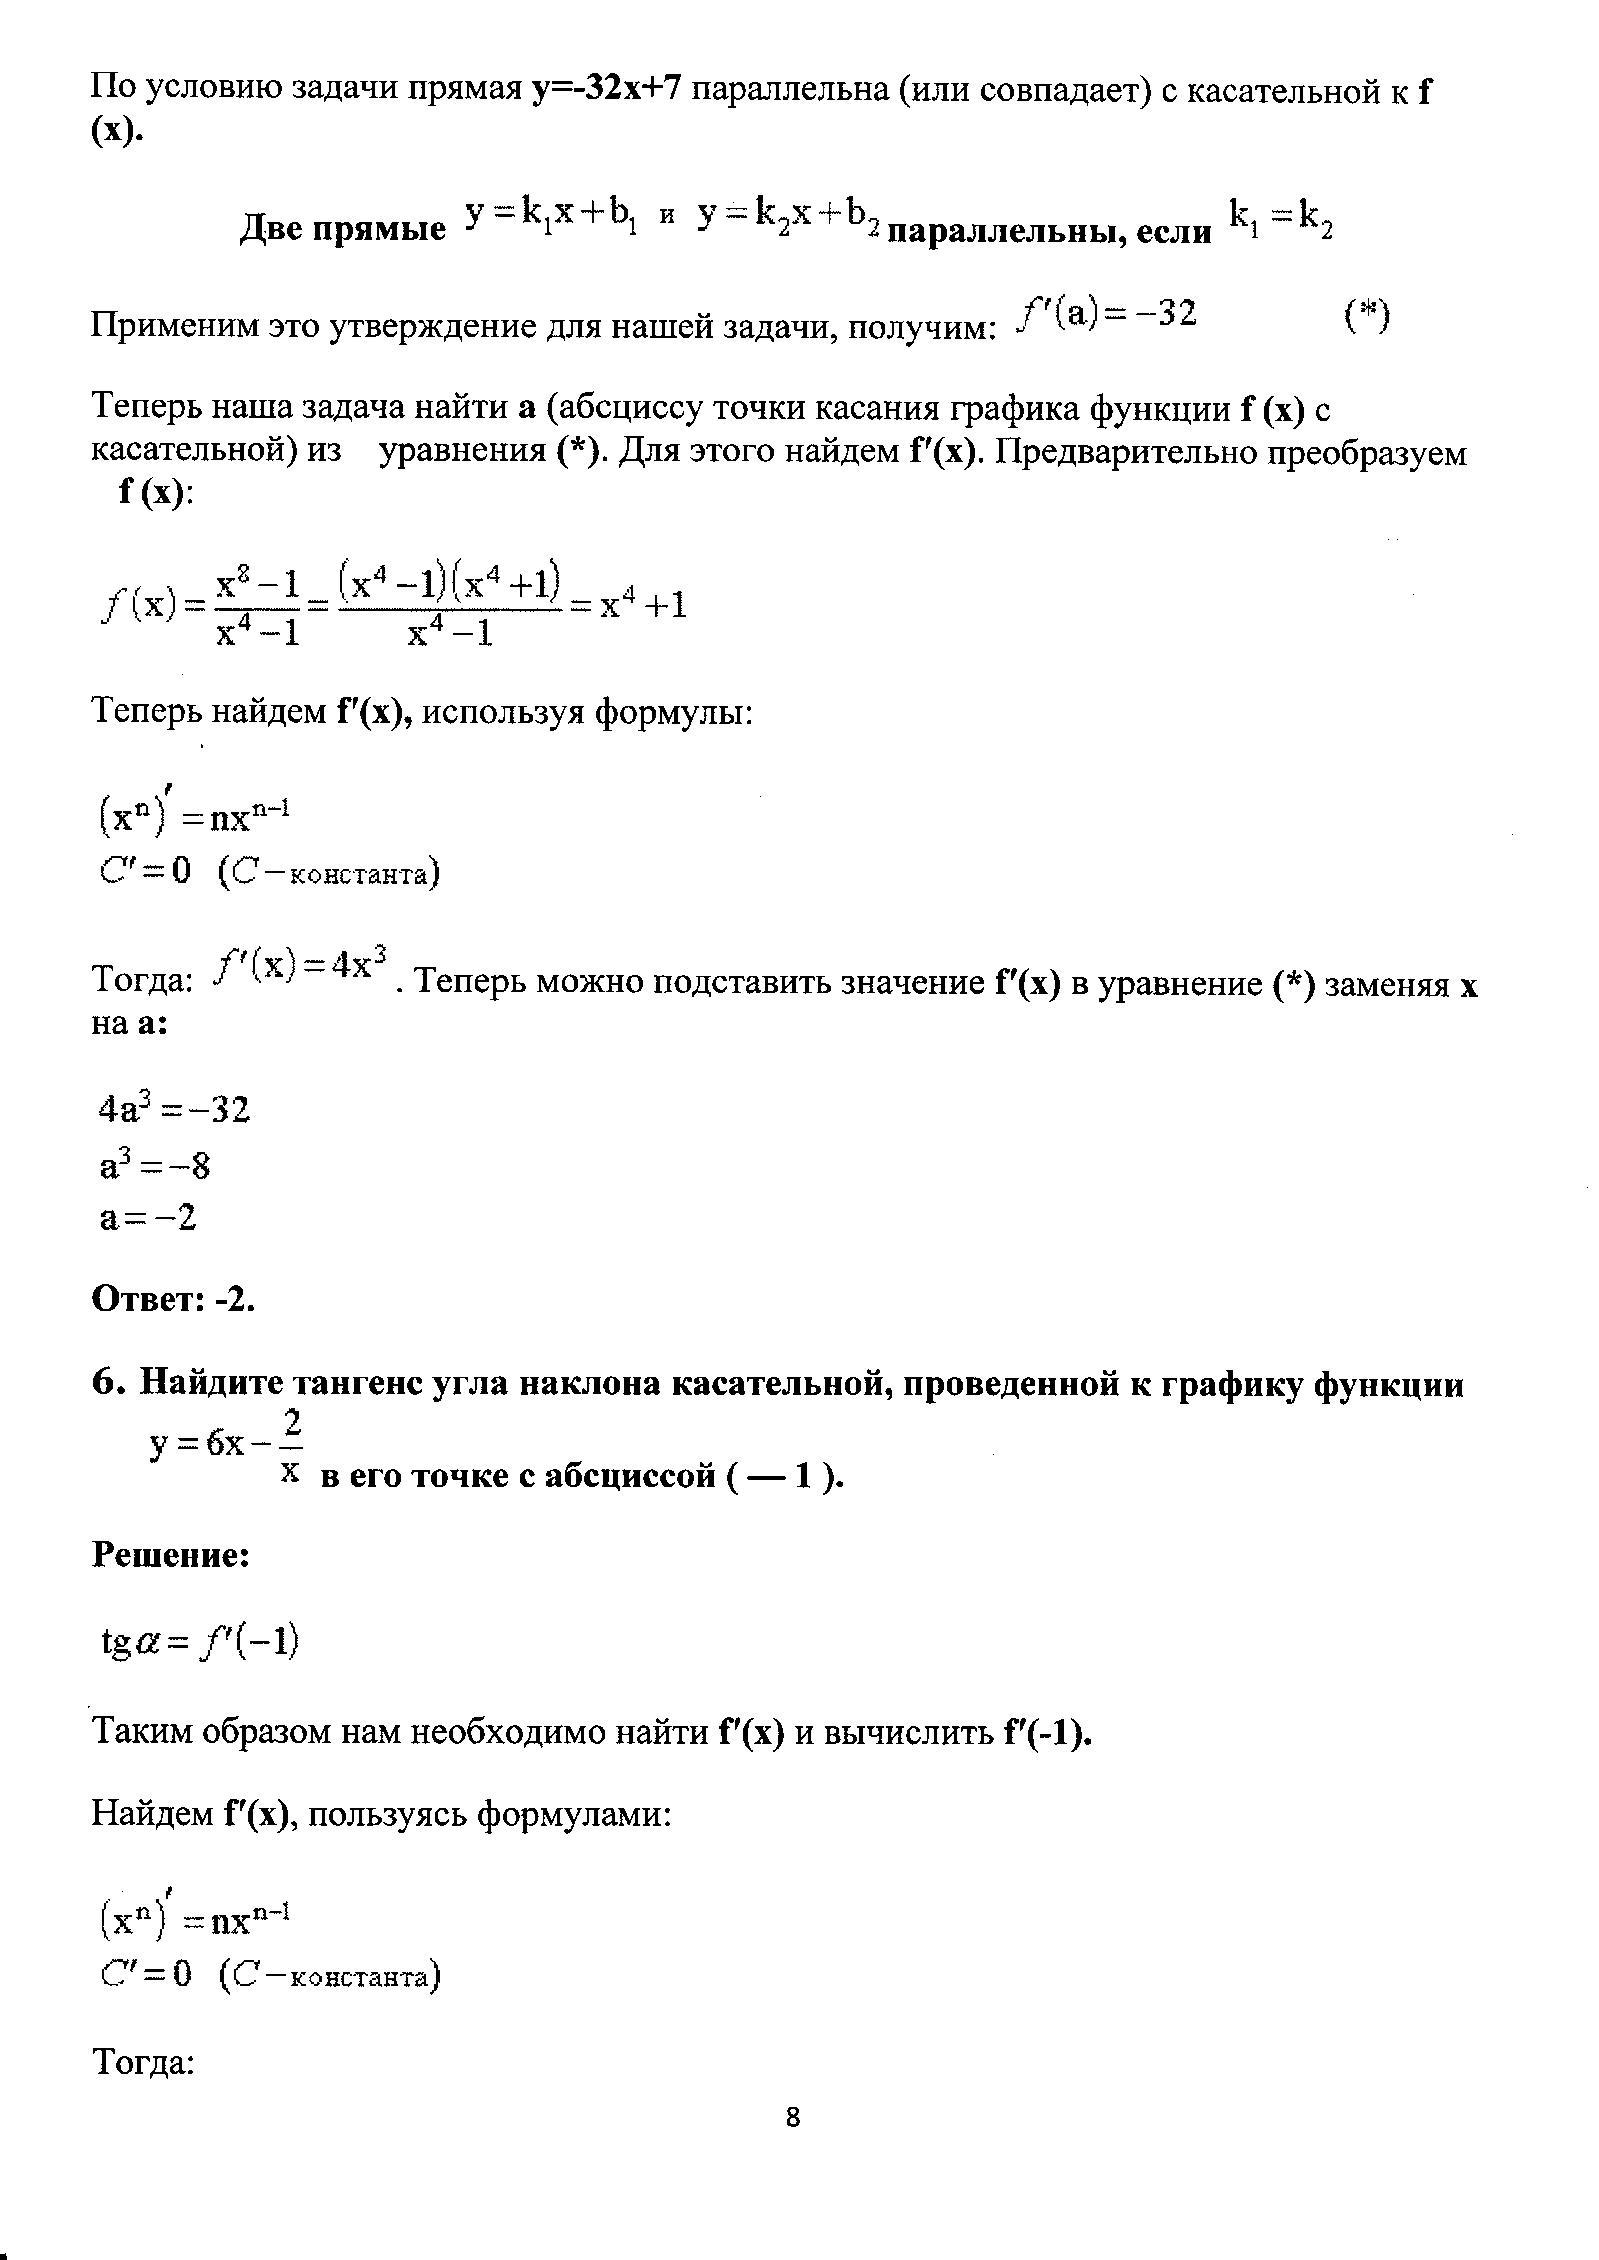 C:\Documents and Settings\Юлия\Мои документы\Мои рисунки\MP Navigator EX\2012_02_20\IMG_0008.tif